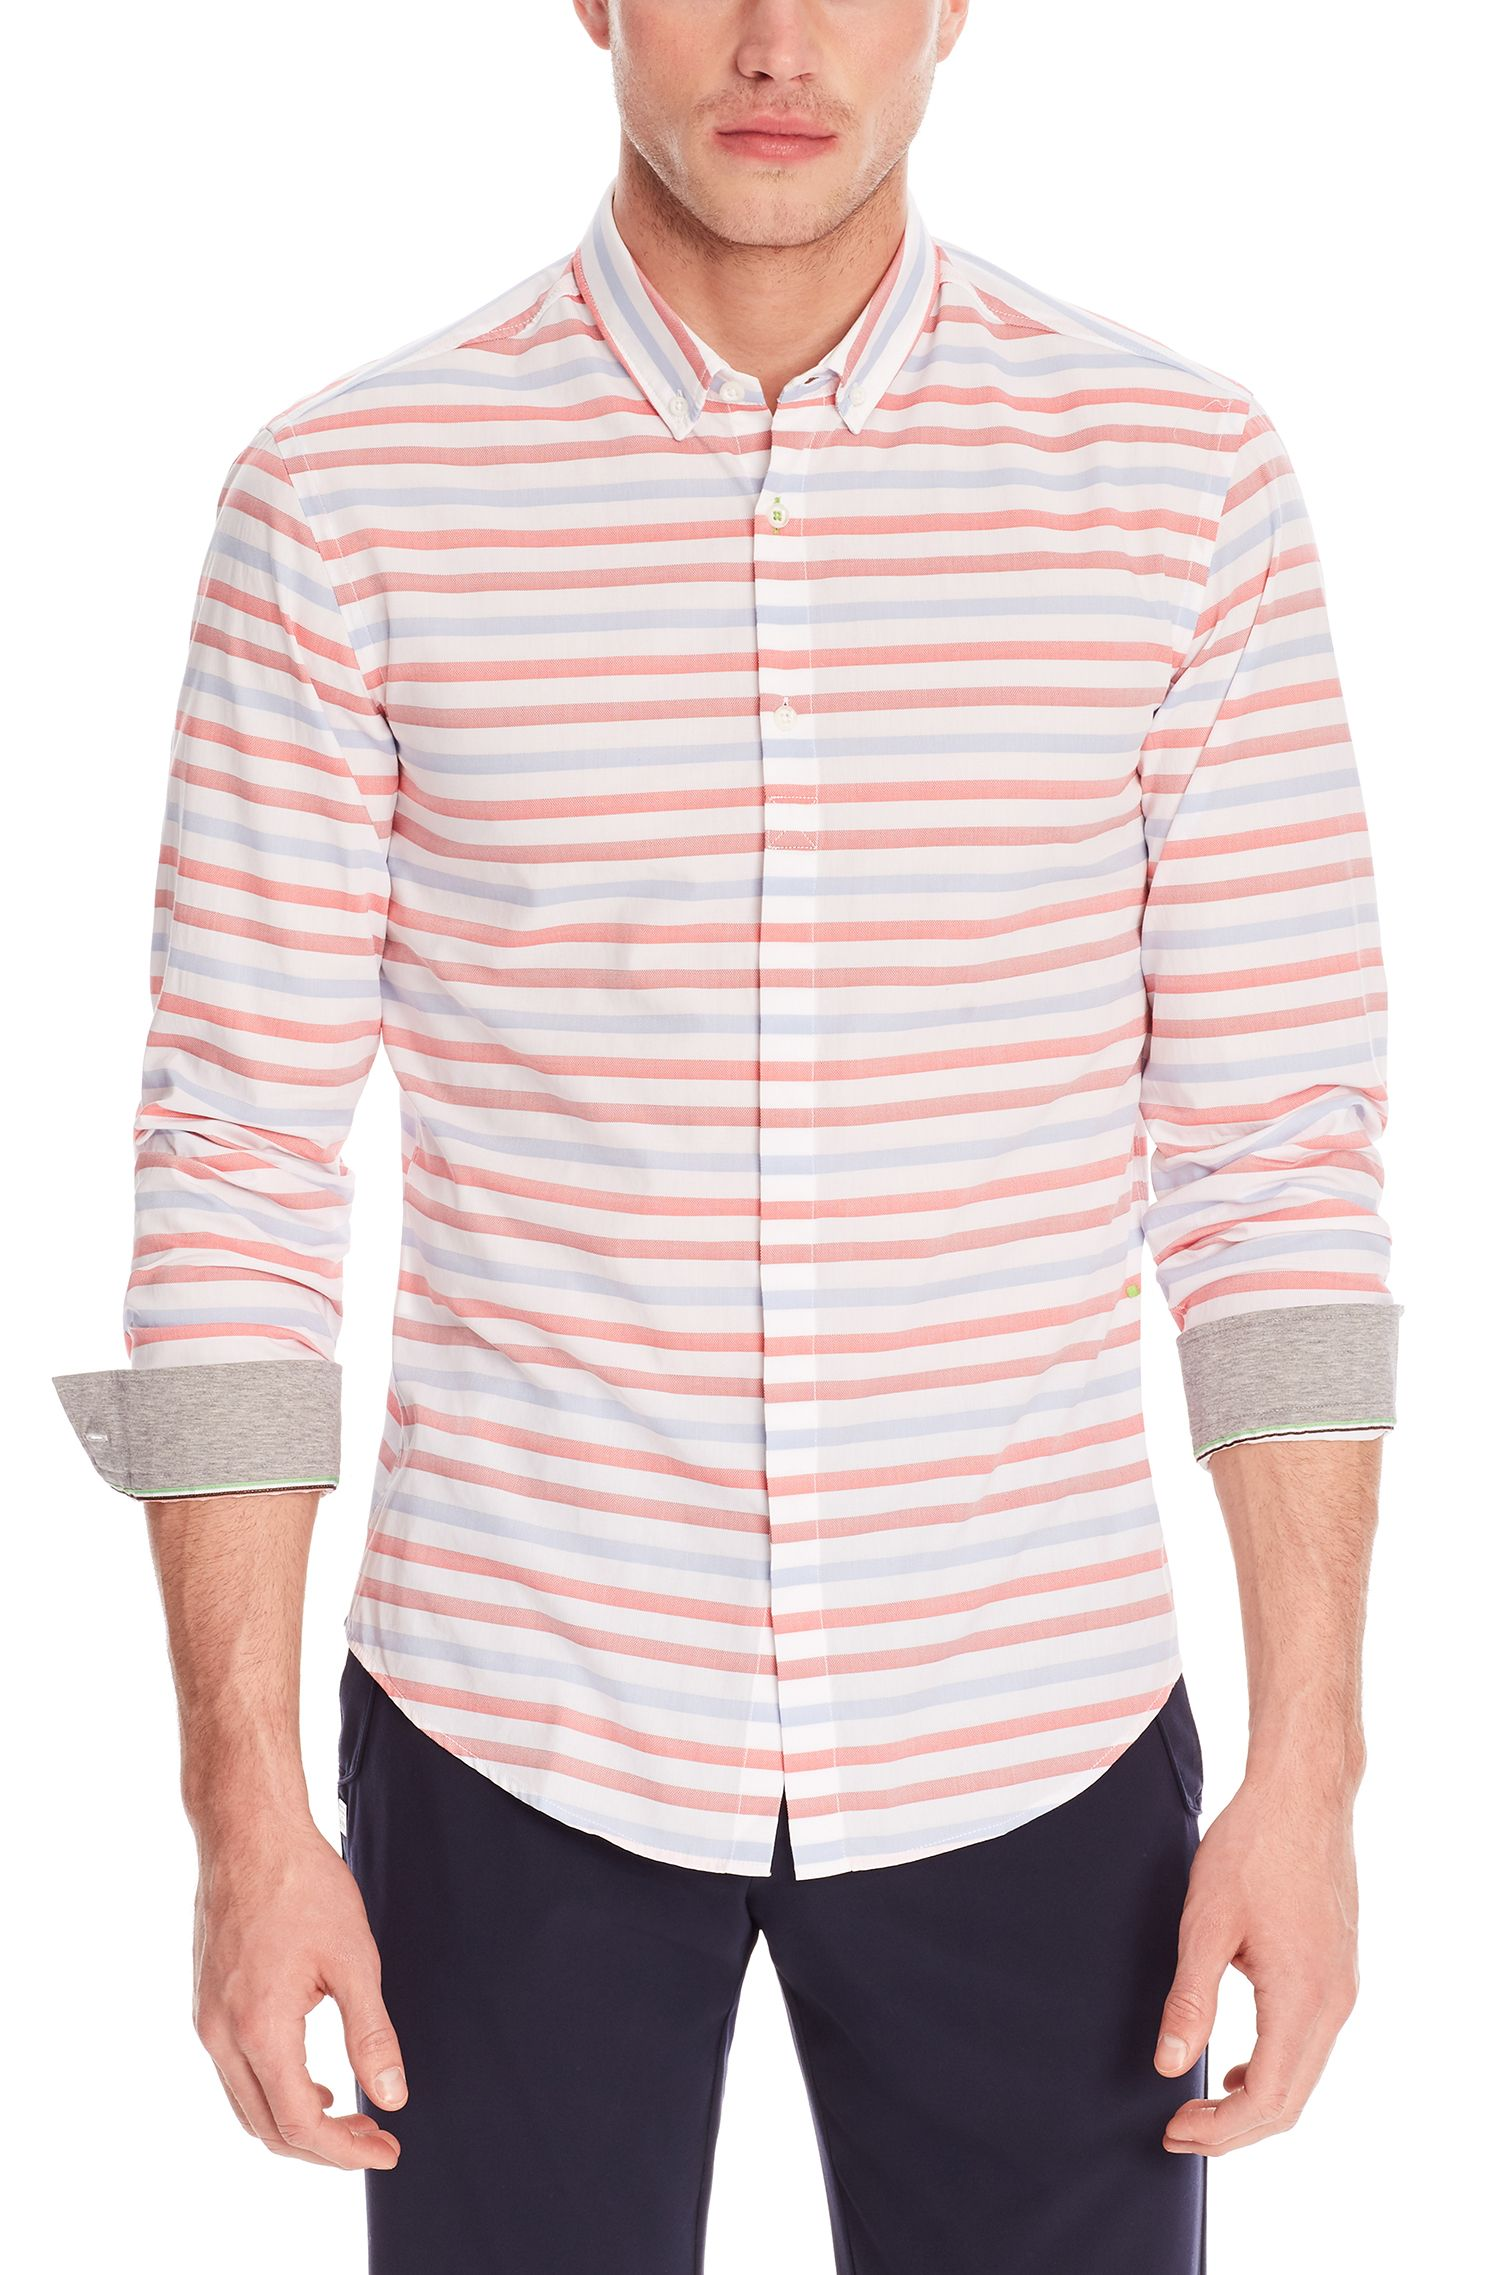 Cotton Sport Shirt, Slim Fit | Belfiore